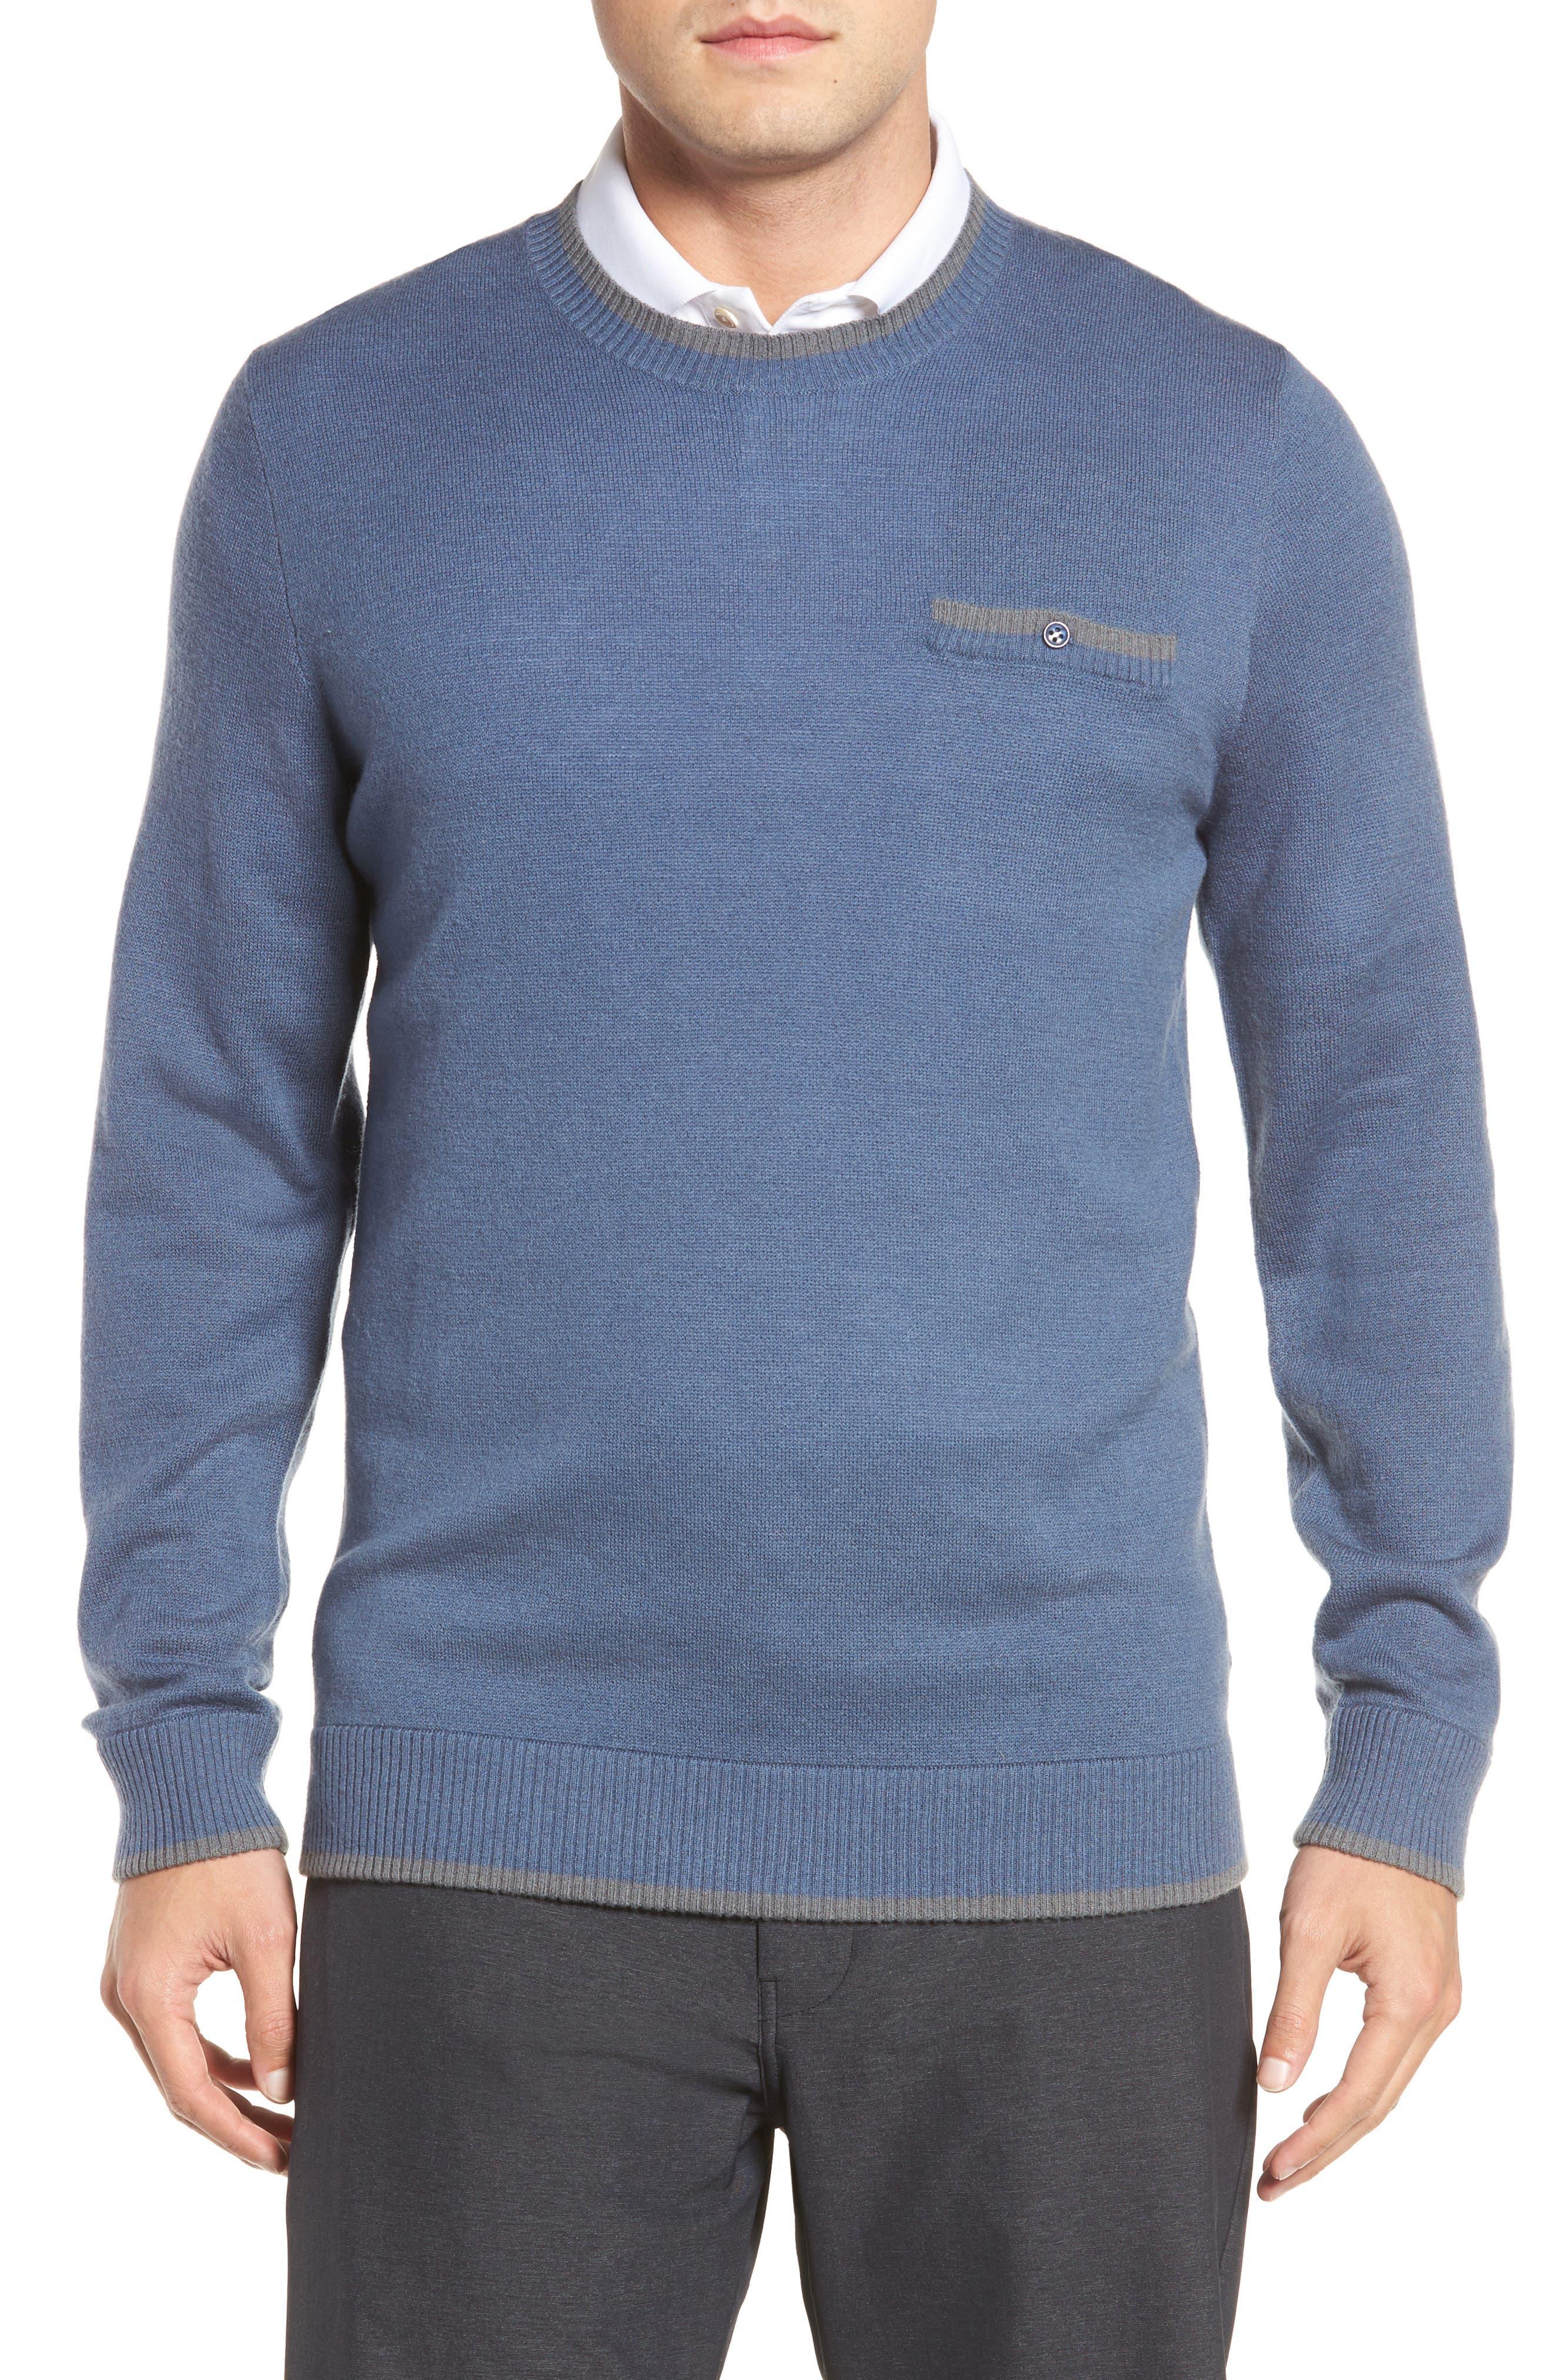 Travis Mathew Paglia Wool Blend Sweater